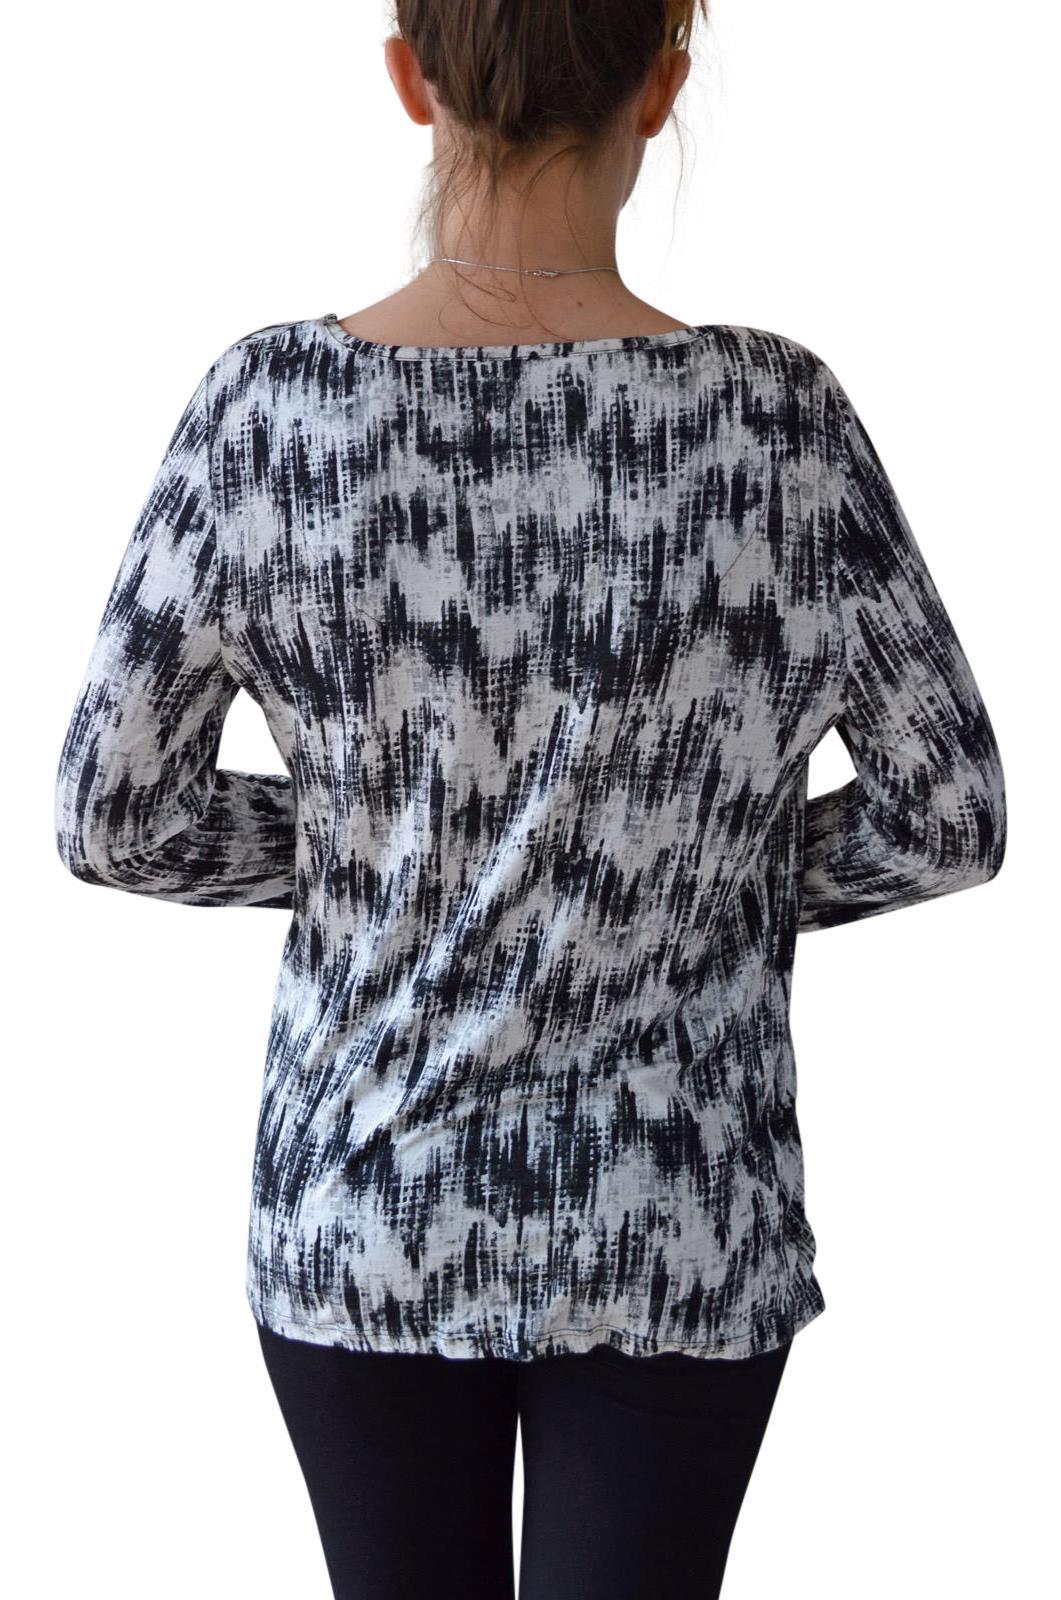 Black White Brush Stroke Print Stretch Wrap Top RRP £25